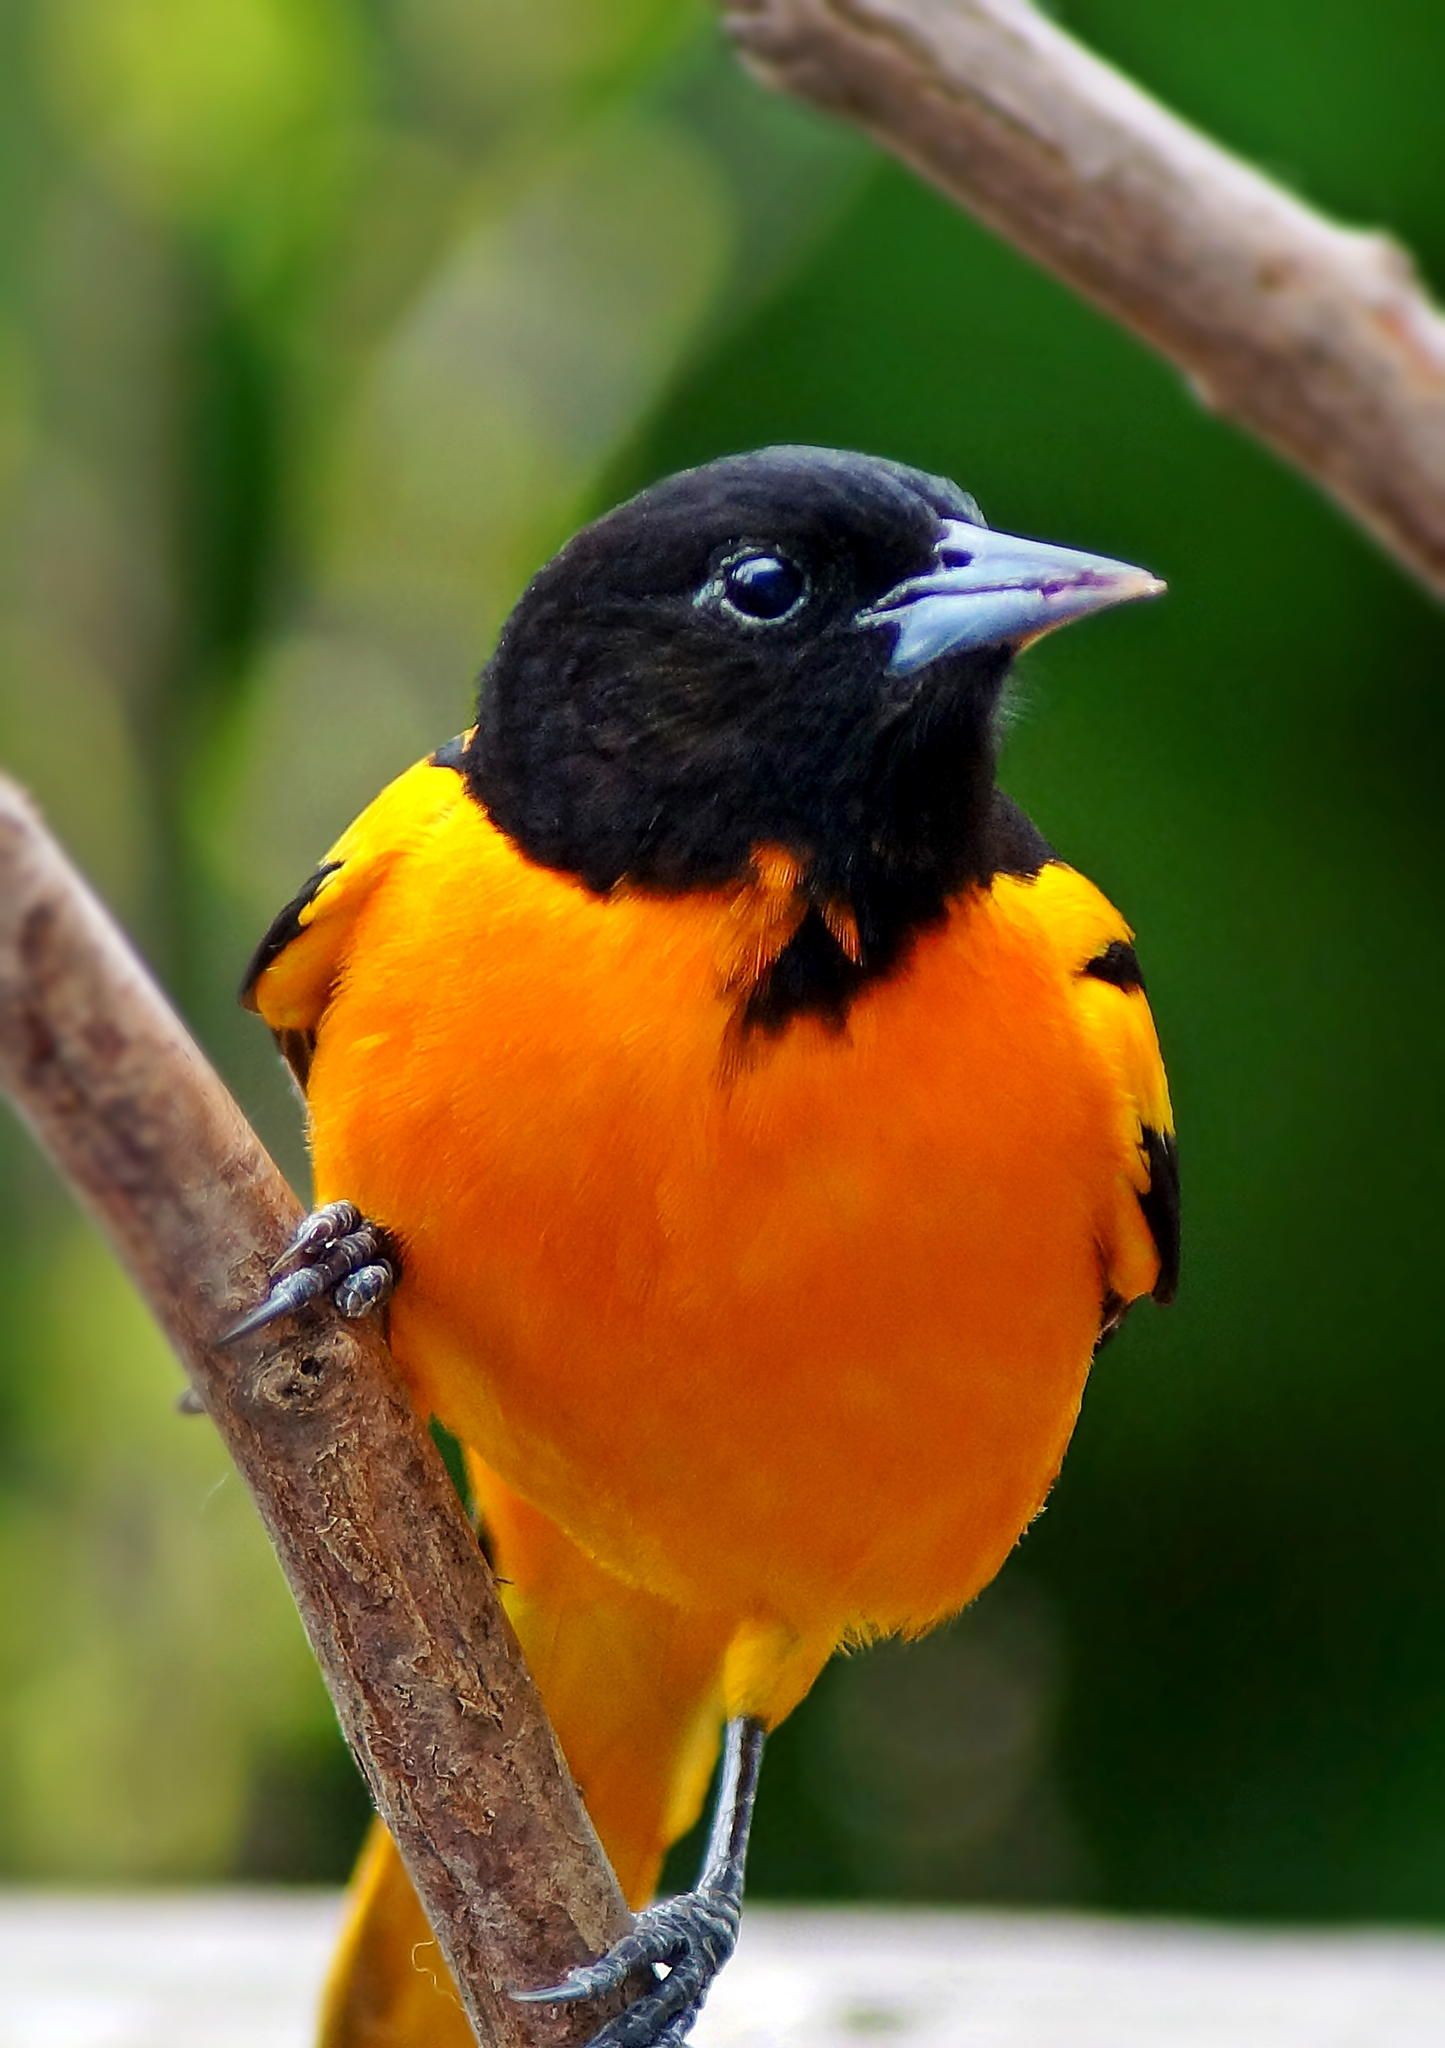 Baltimore Oriole Beautiful Birds Most Beautiful Birds Backyard Birds